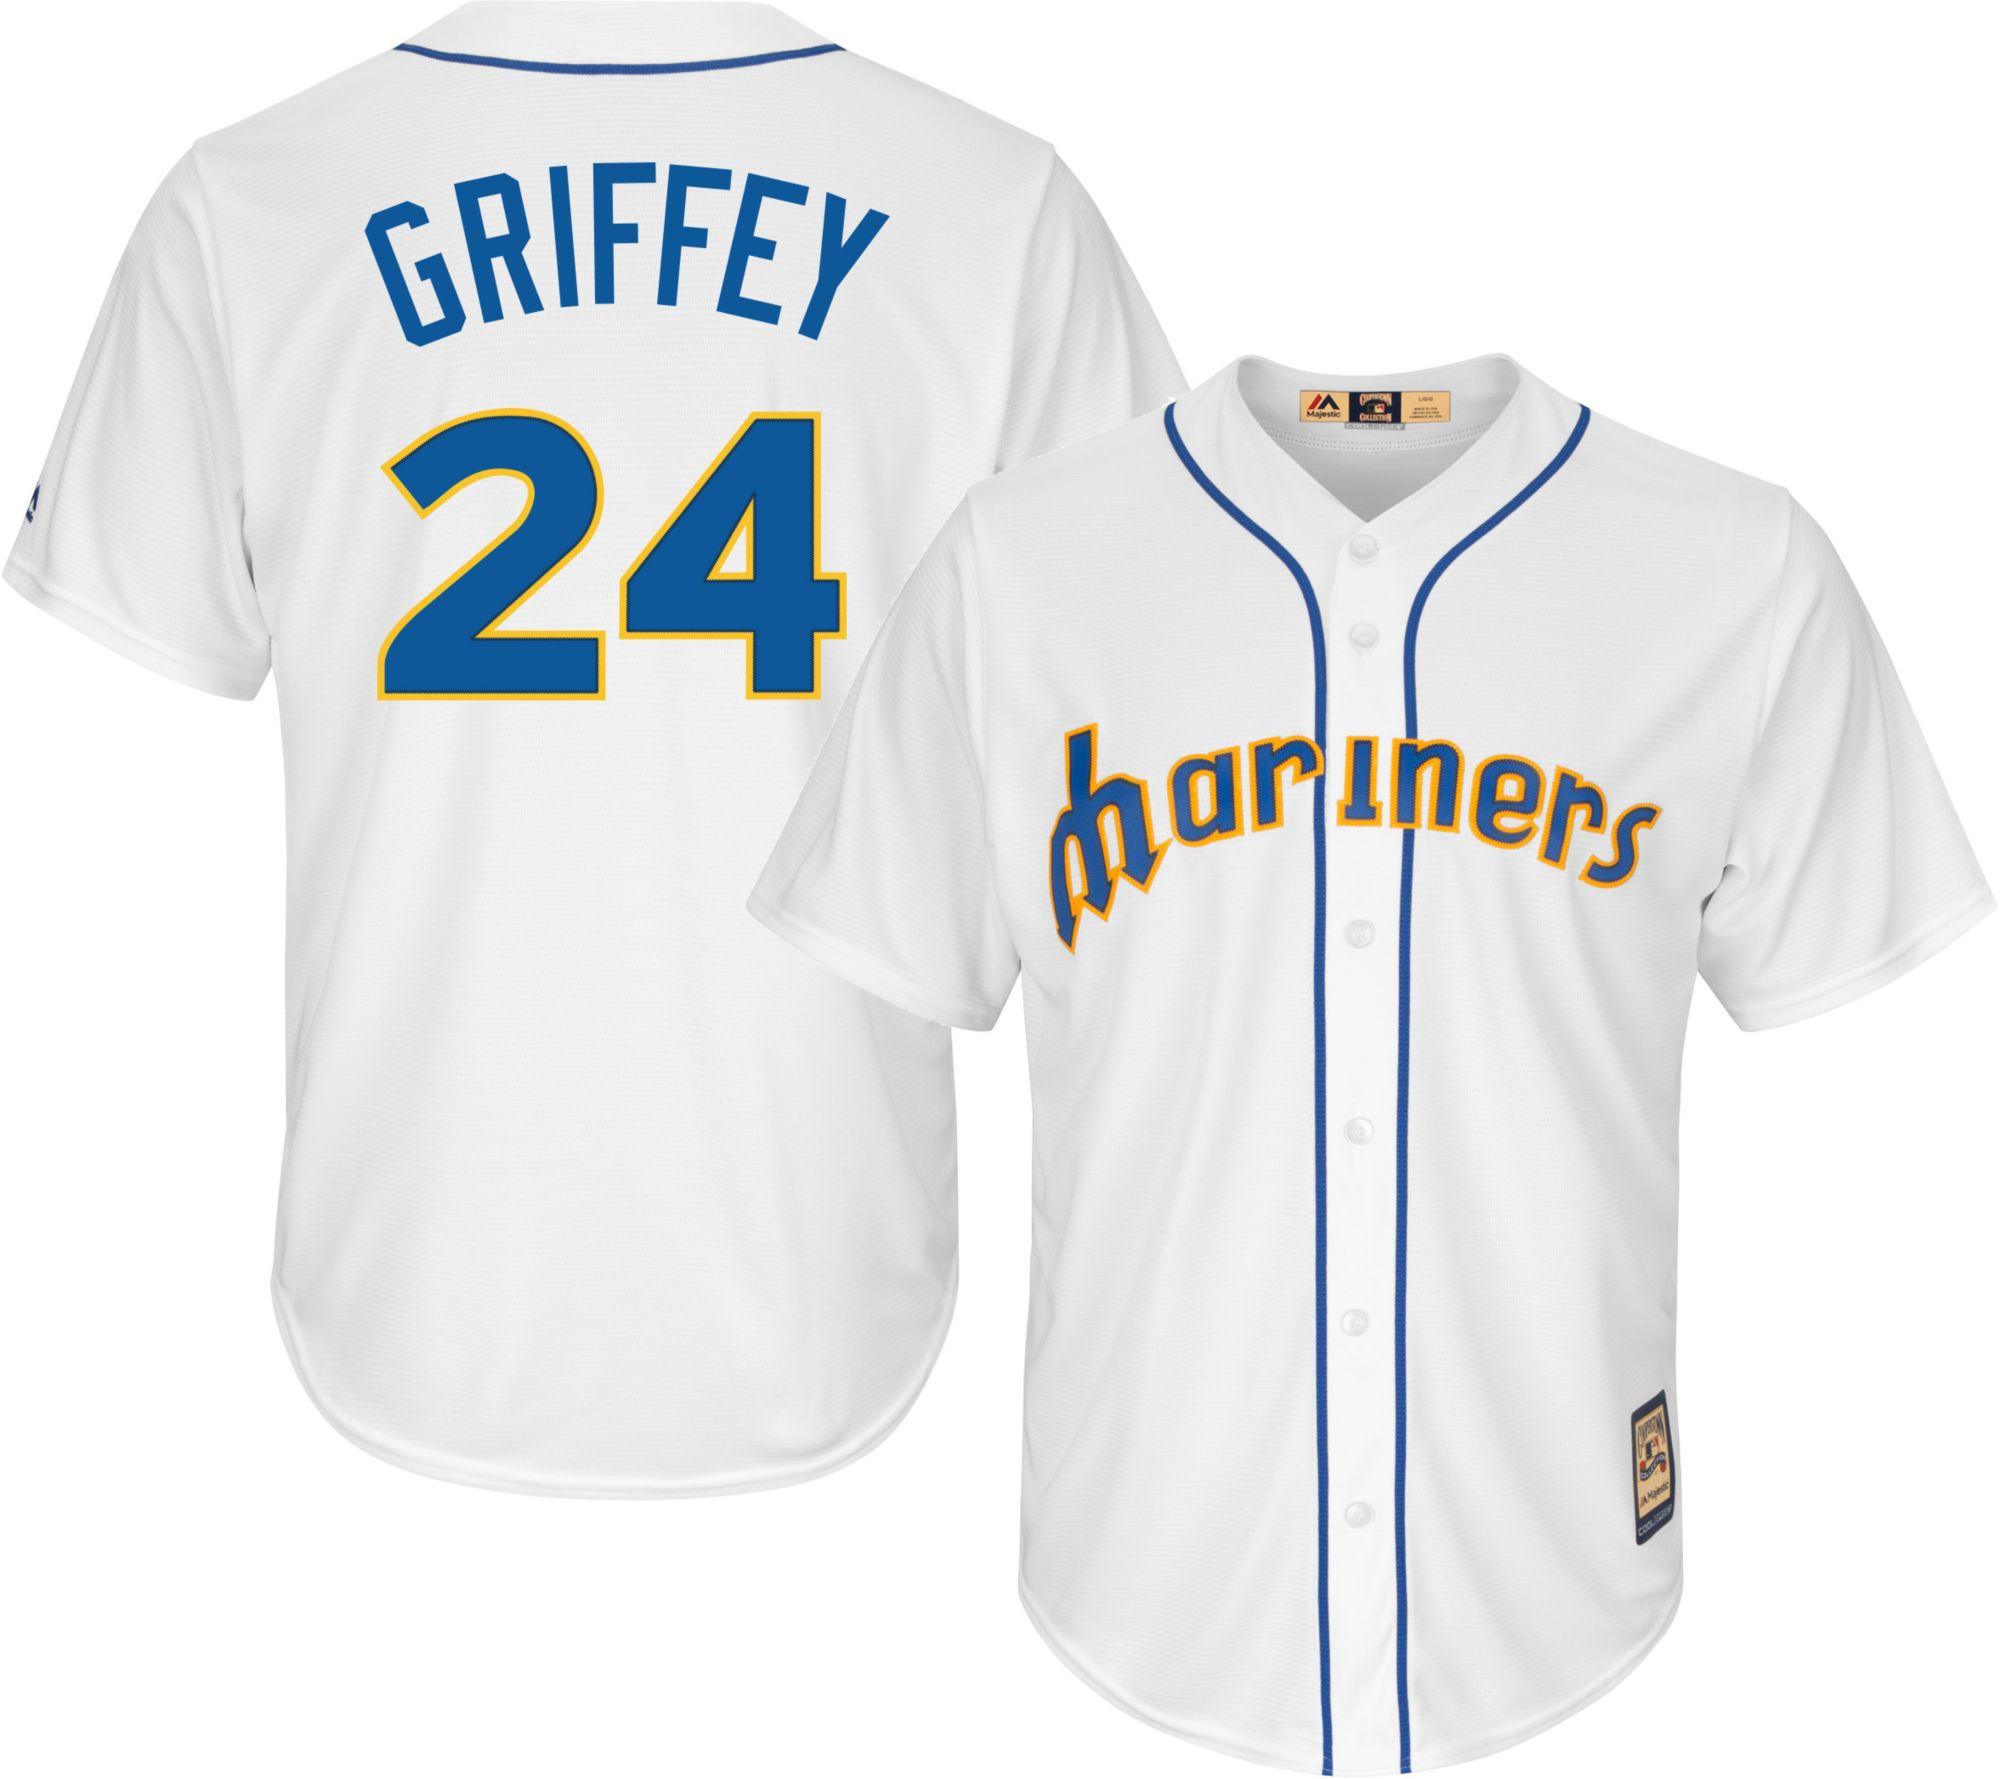 e8f57251c ... Majestic Mens Replica Seattle Mariners Ken Griffey Jr. Cool ...